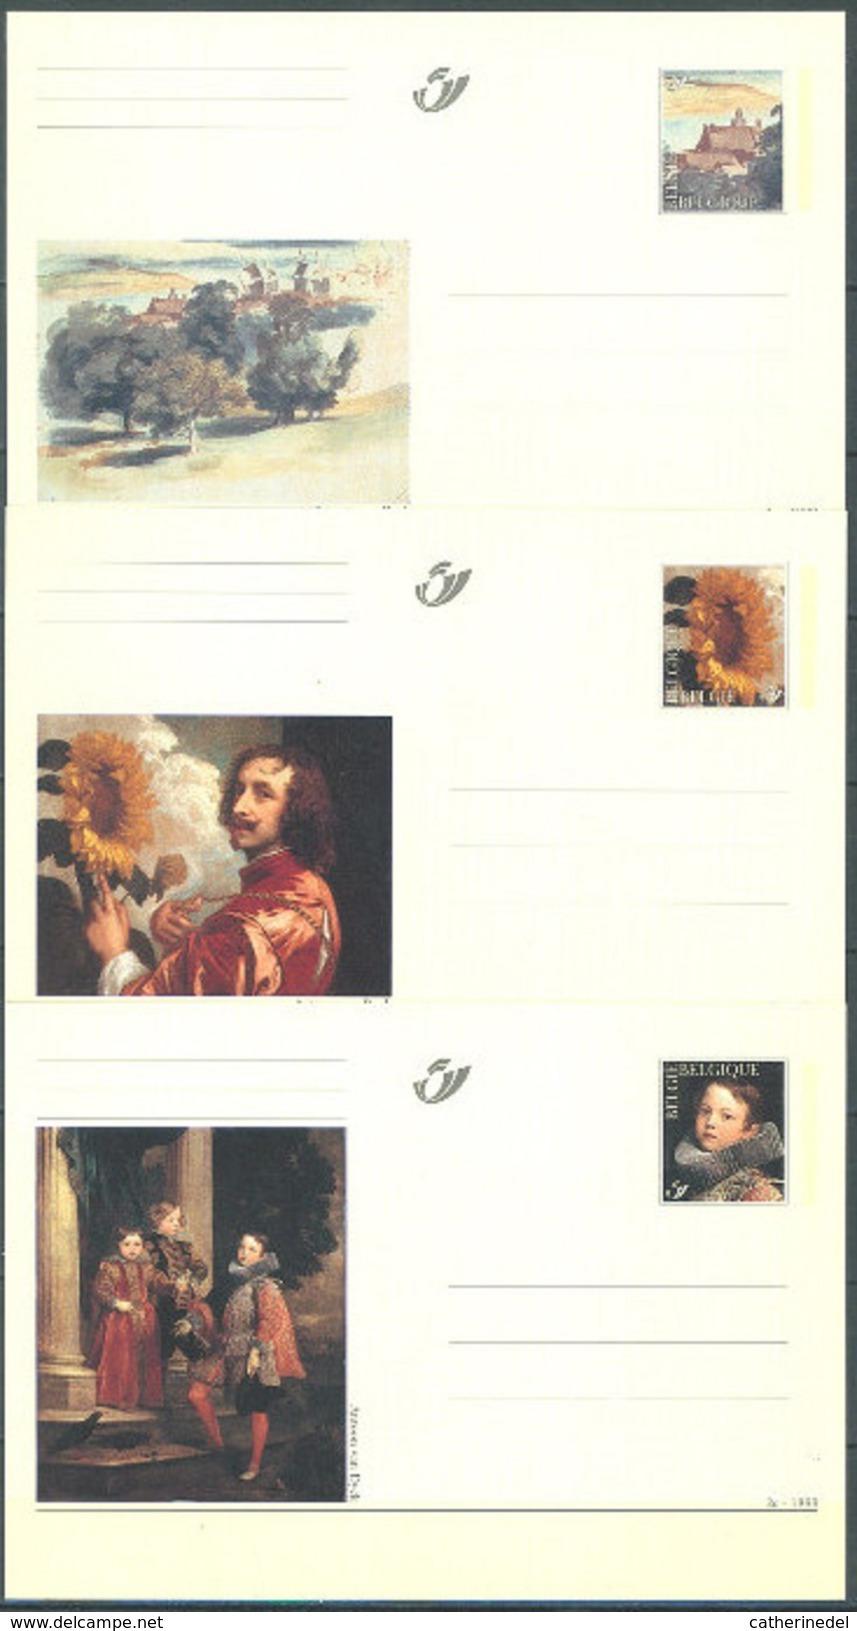 Année 1999 : CA71-CA73/BK71-BK73 - Antoon Van Dyck - Cartes Postales [1951-..]